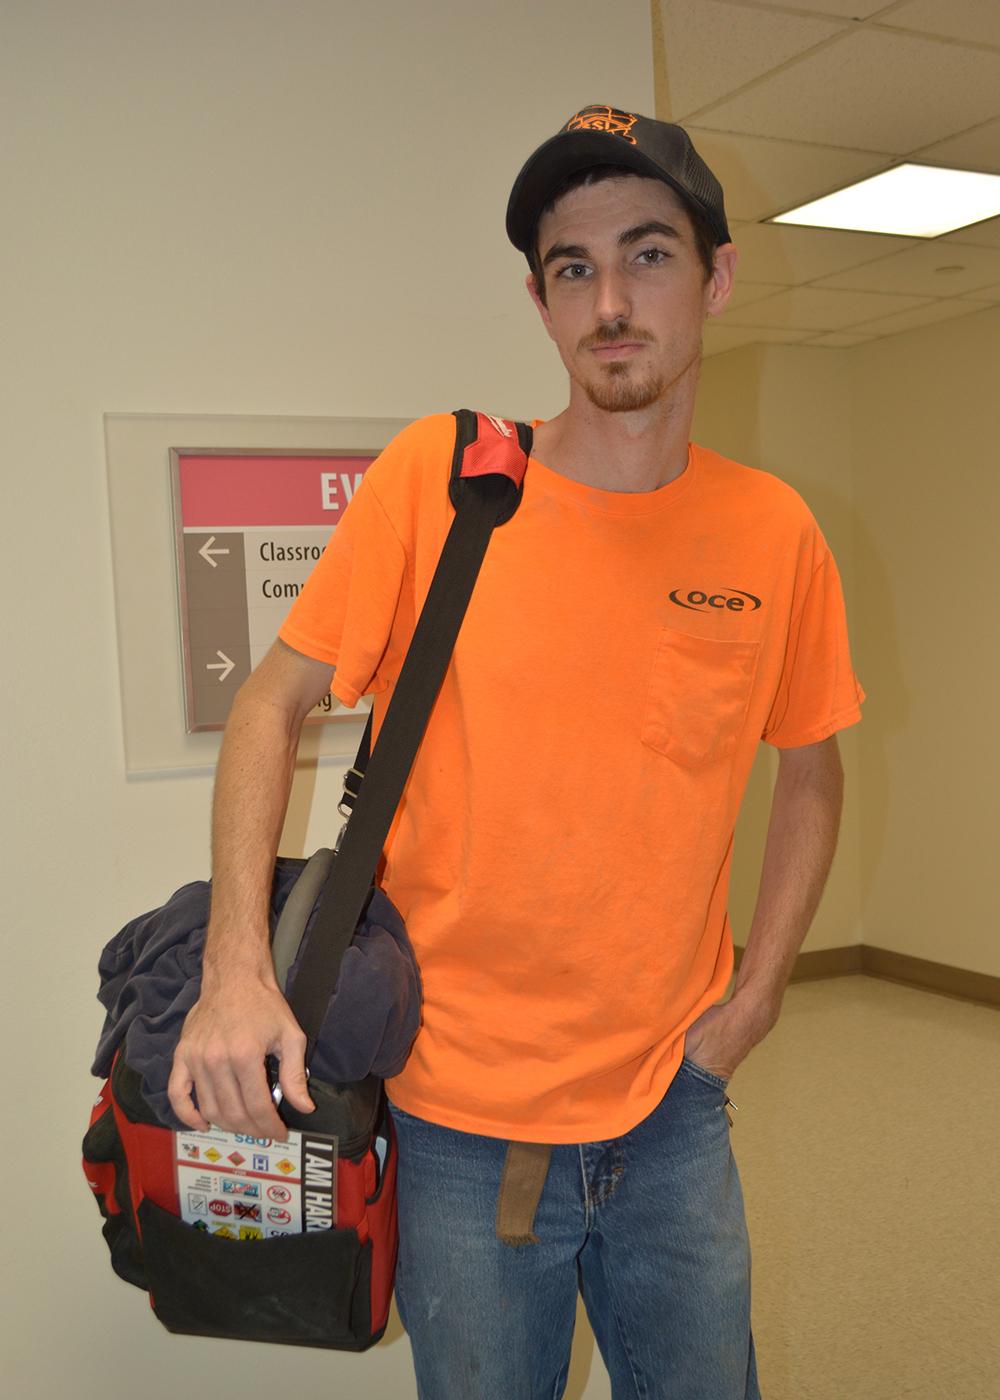 Man wearing cap holds a large bag over his shoulder